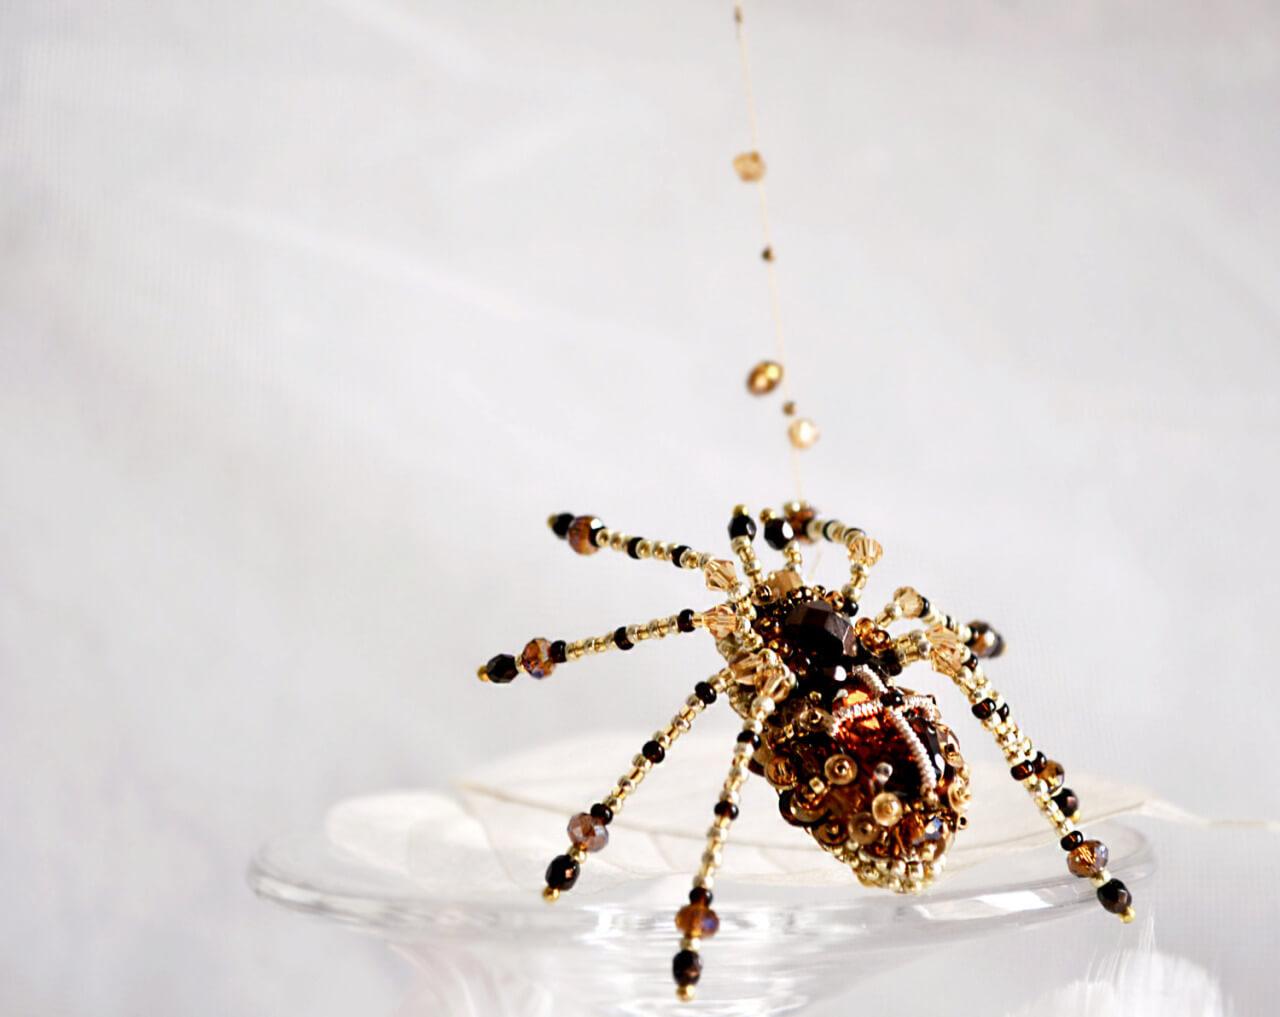 Spider Jewelry 3 (1)